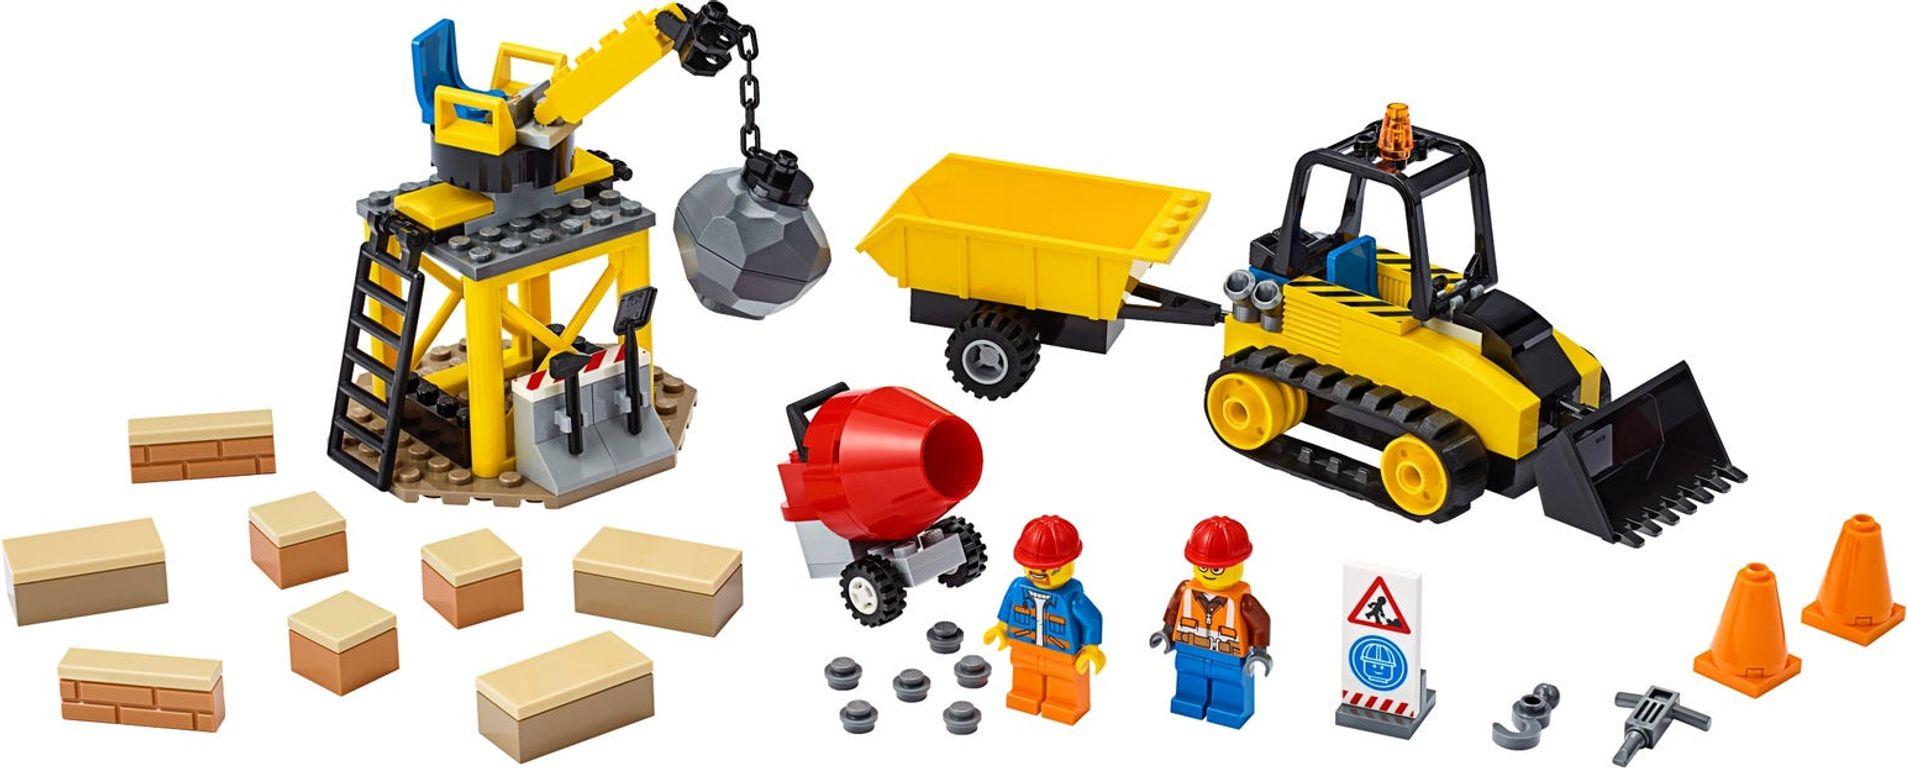 LEGO® City Construction Bulldozer components